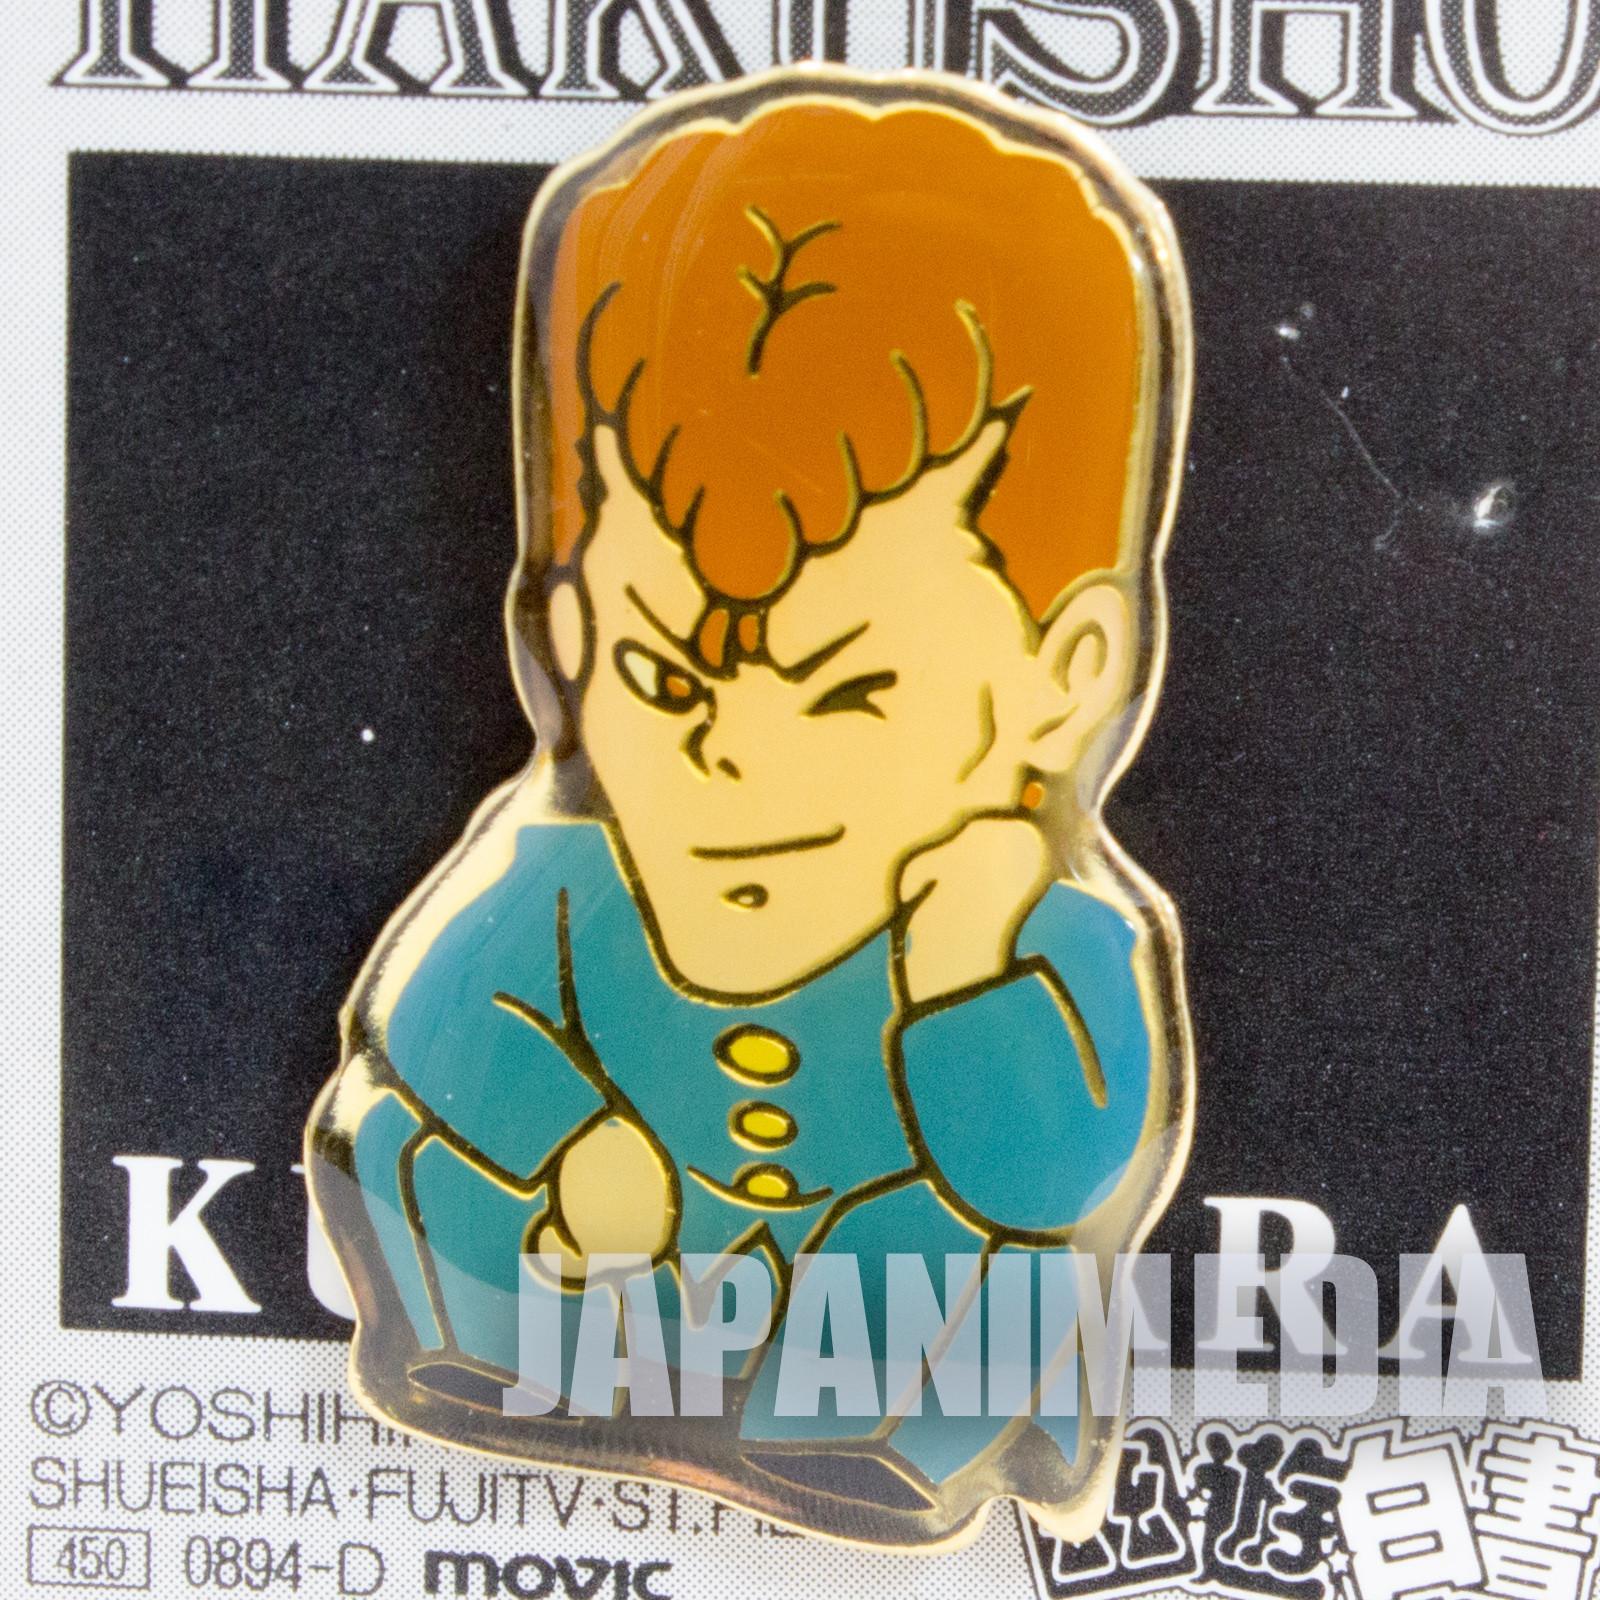 RARE Yu Yu Hakusho Kazuma Kuwabara Pins Movic JAPAN ANIME MANGA